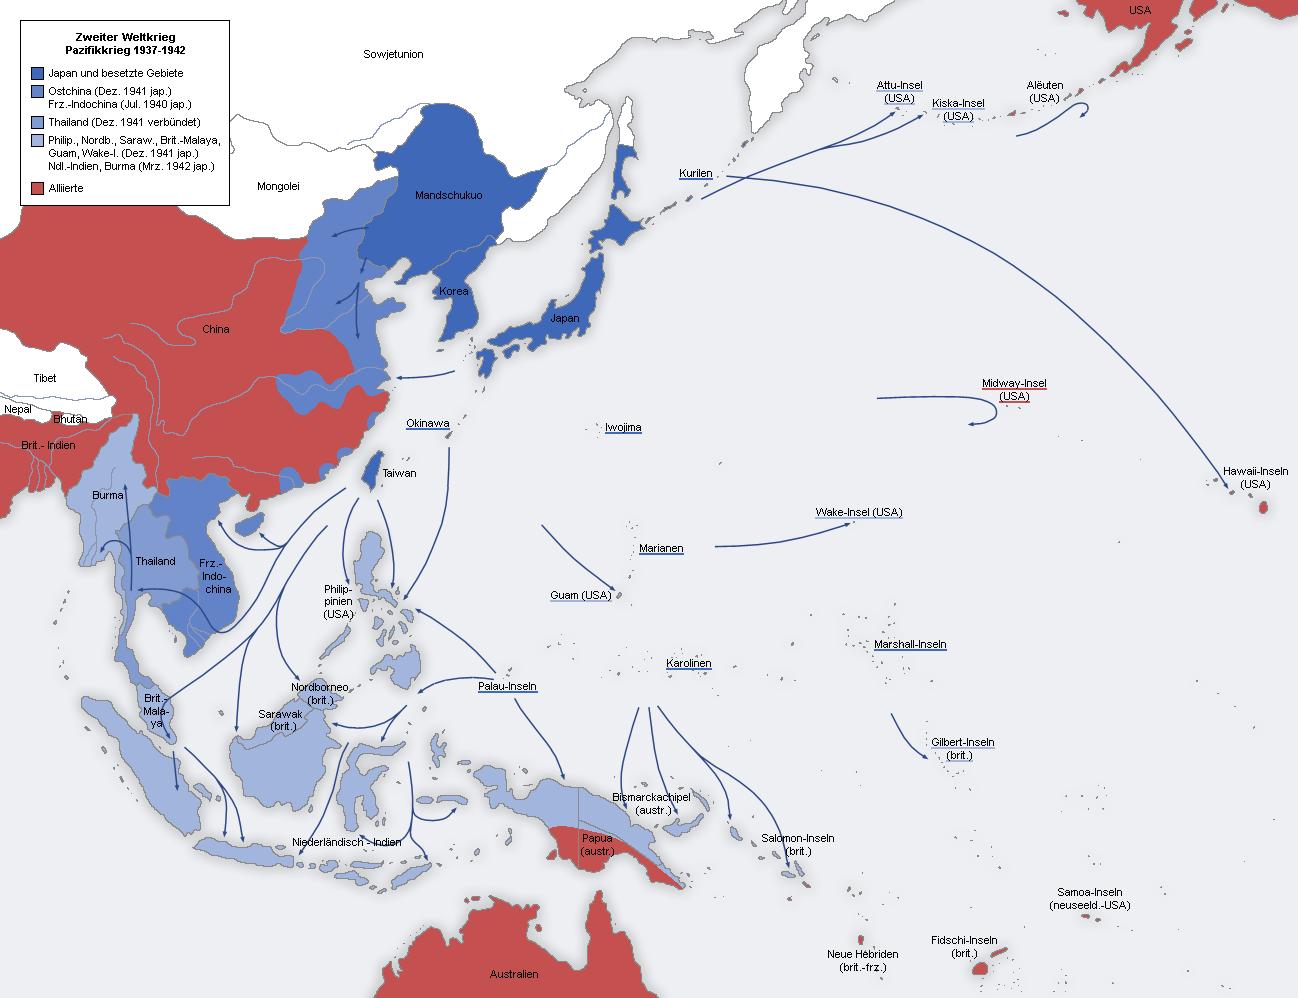 mapa-pacifico-avance-japones-1941-1942-segunda-guerra-mundial